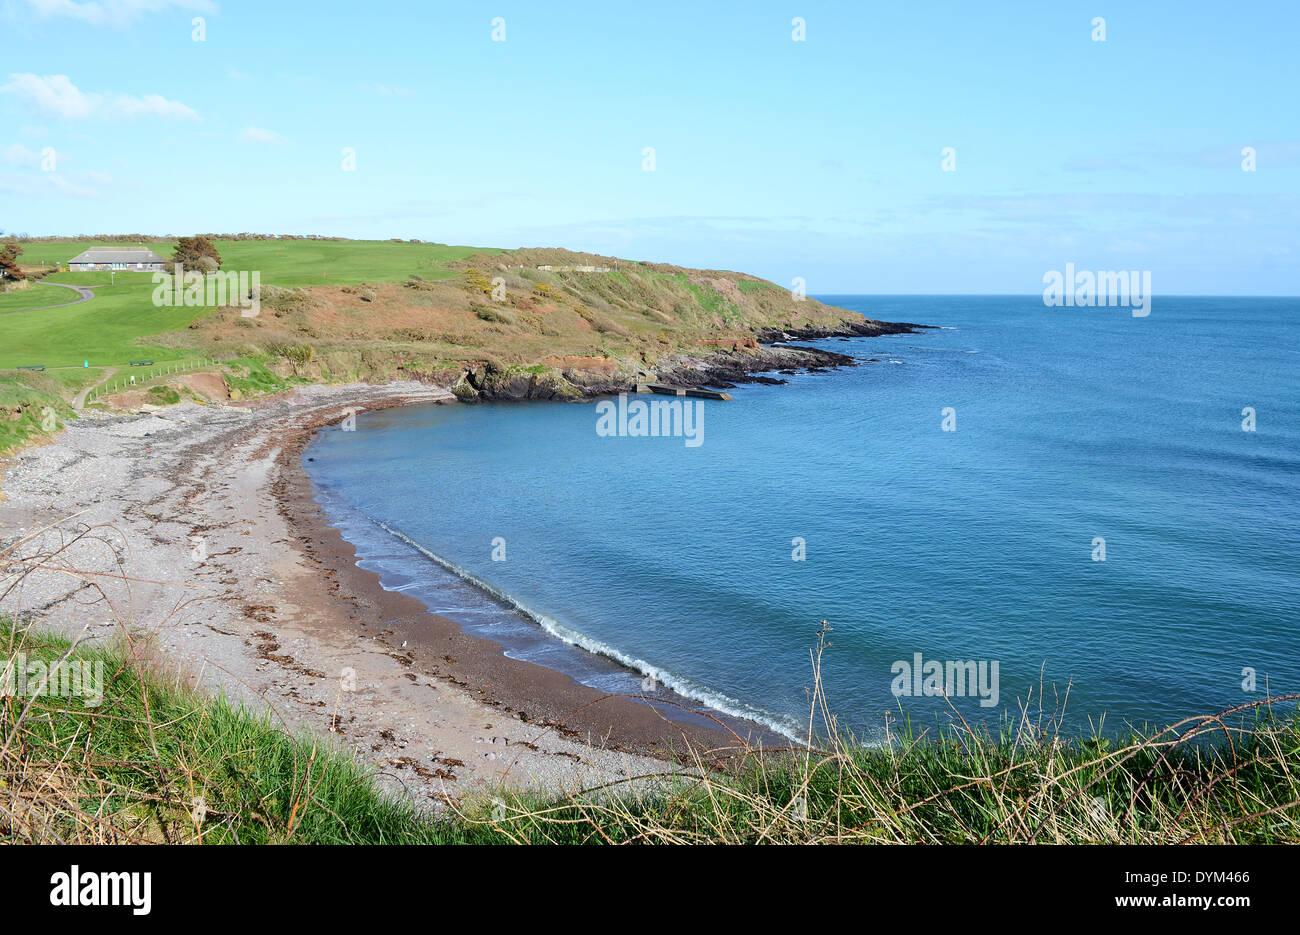 the beach near trabolgan on the south west coast of ireland, uk - Stock Image